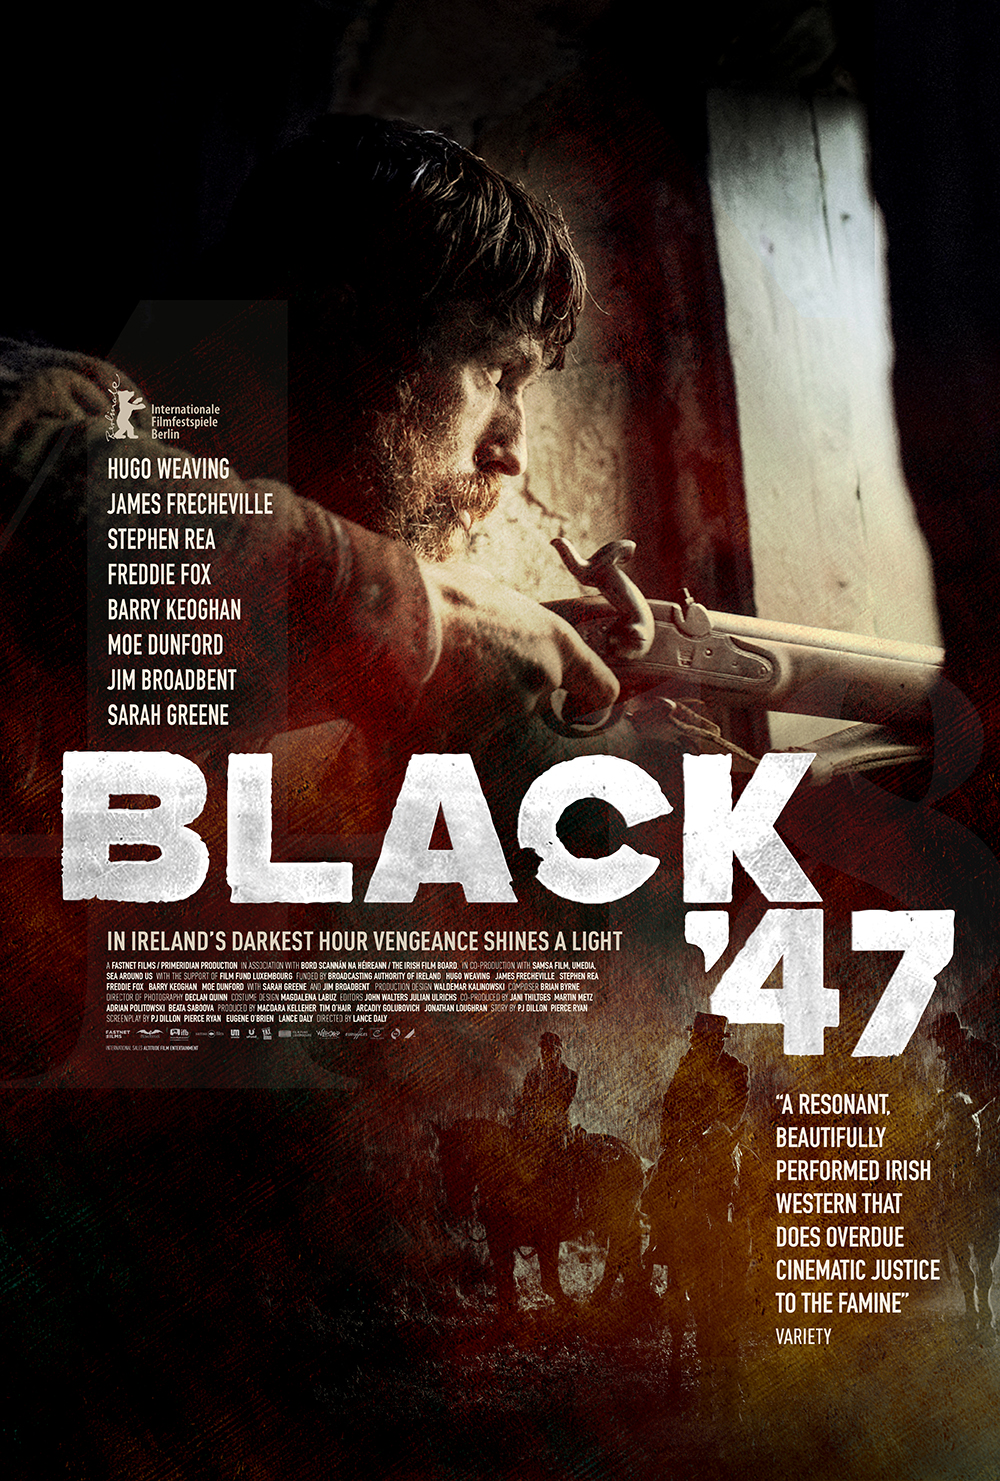 Black 47 Teaser Poster